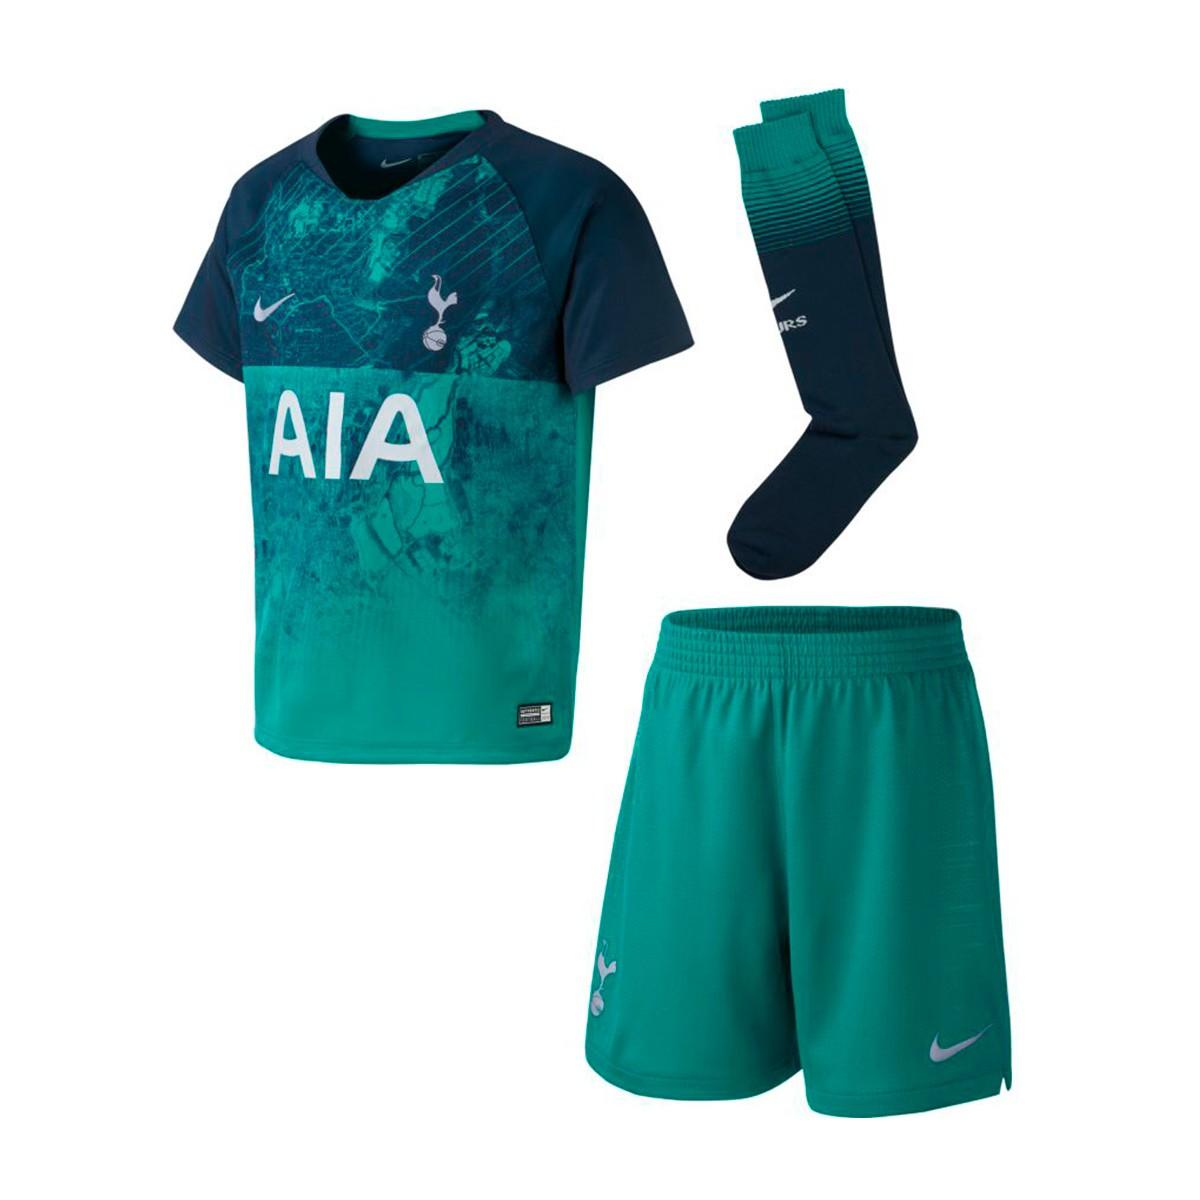 0a87f816815 Kit Nike Kids Tottenham Hotspur FC 2018-2019 Third Neptune green ...